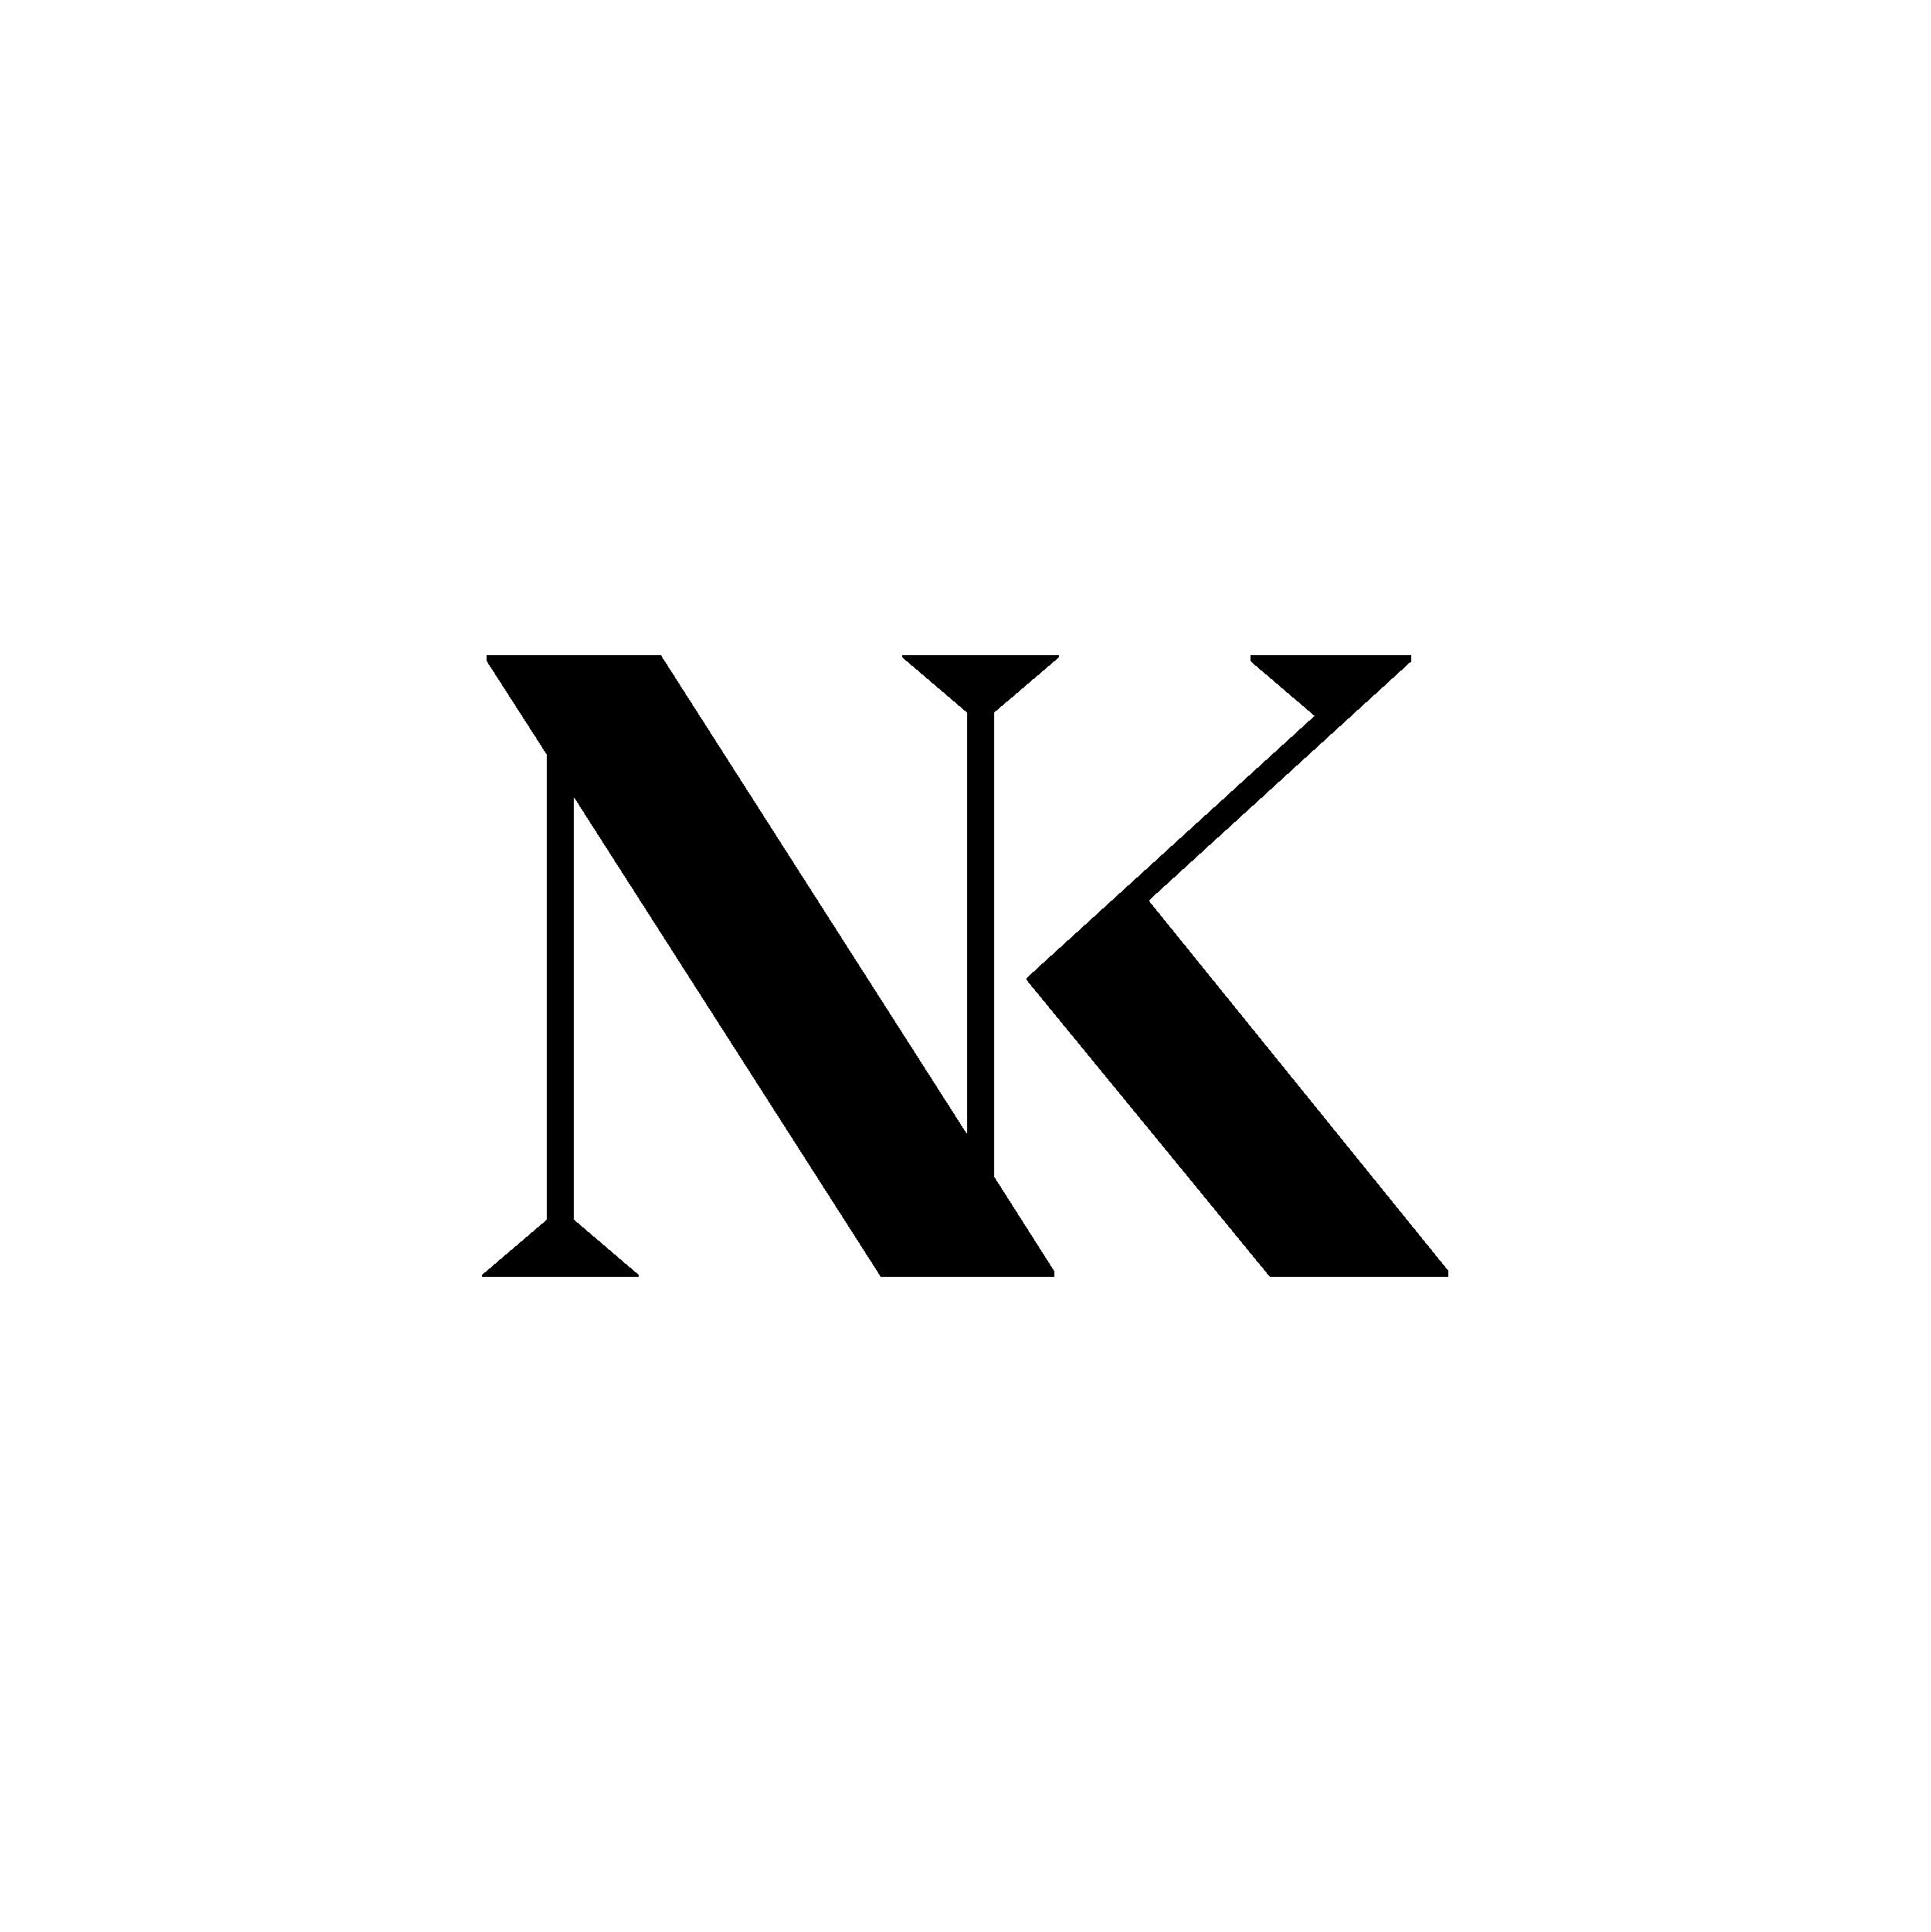 agent-logos-04.png